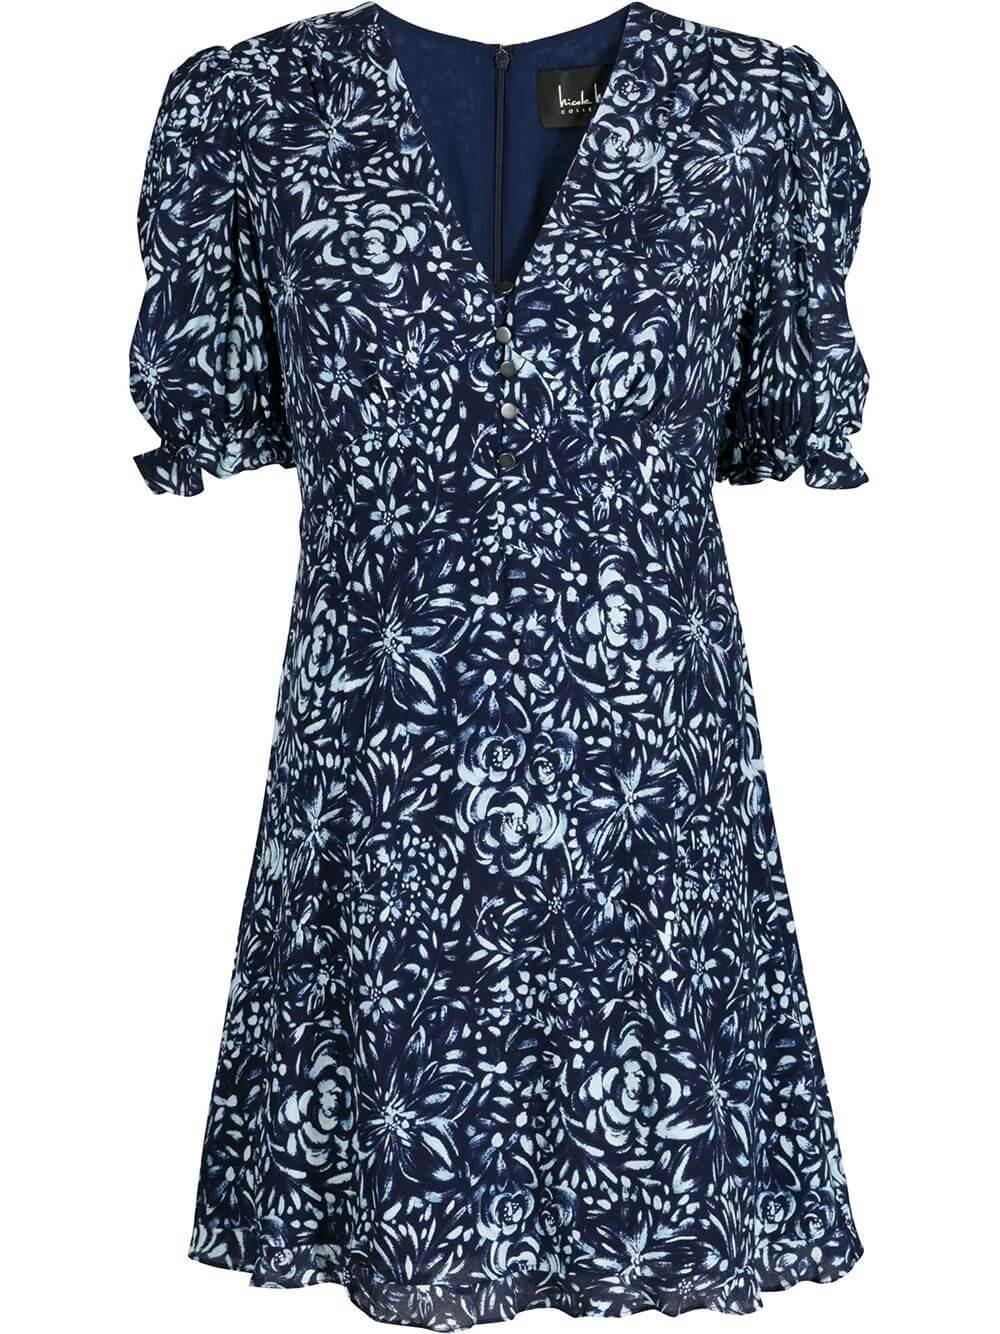 Evening Garden Mini Dress Item # CD18674